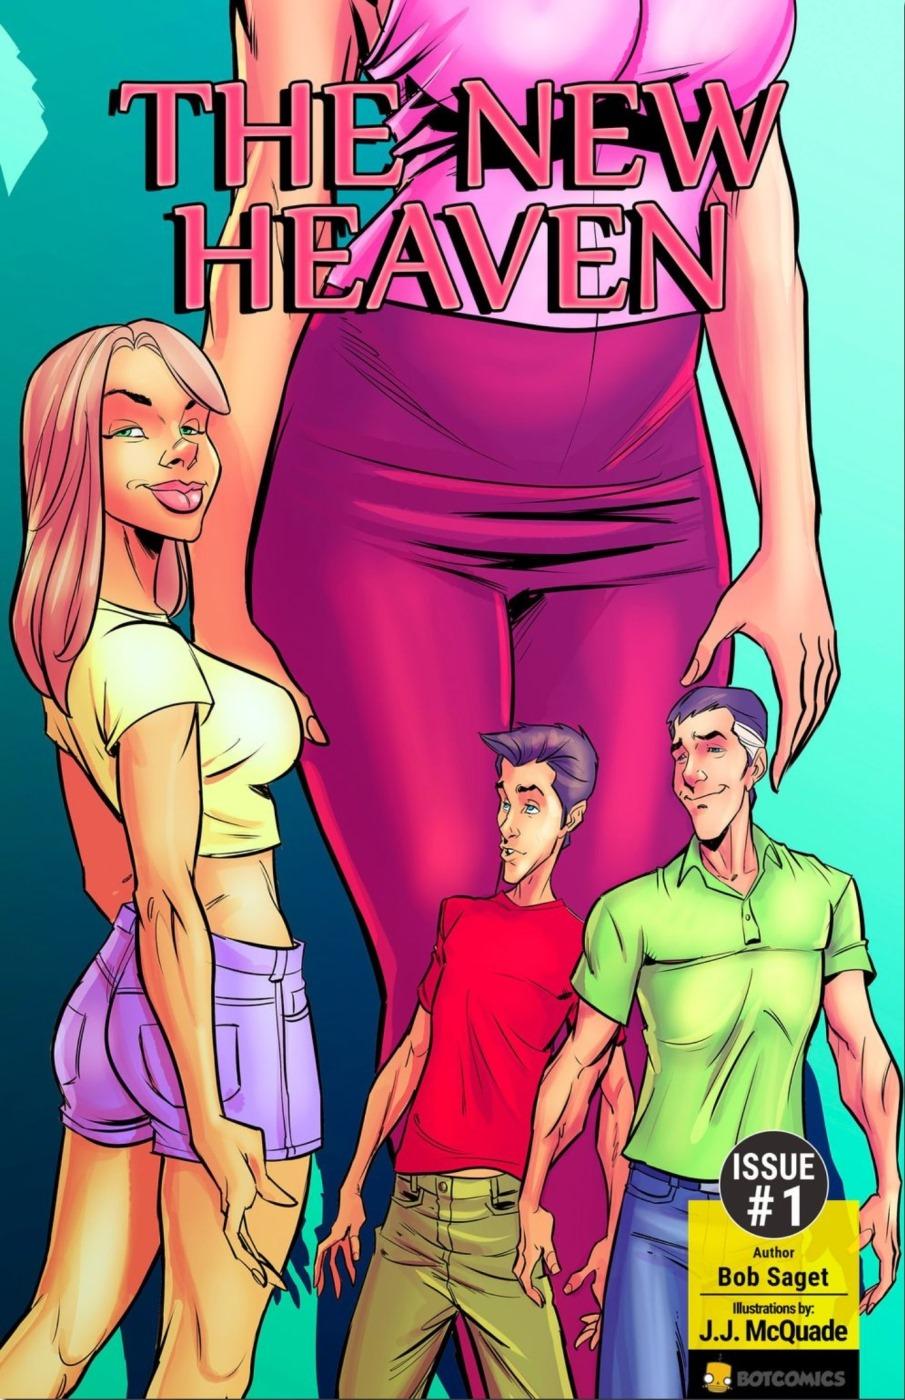 New Heaven 1 & 2 image 1